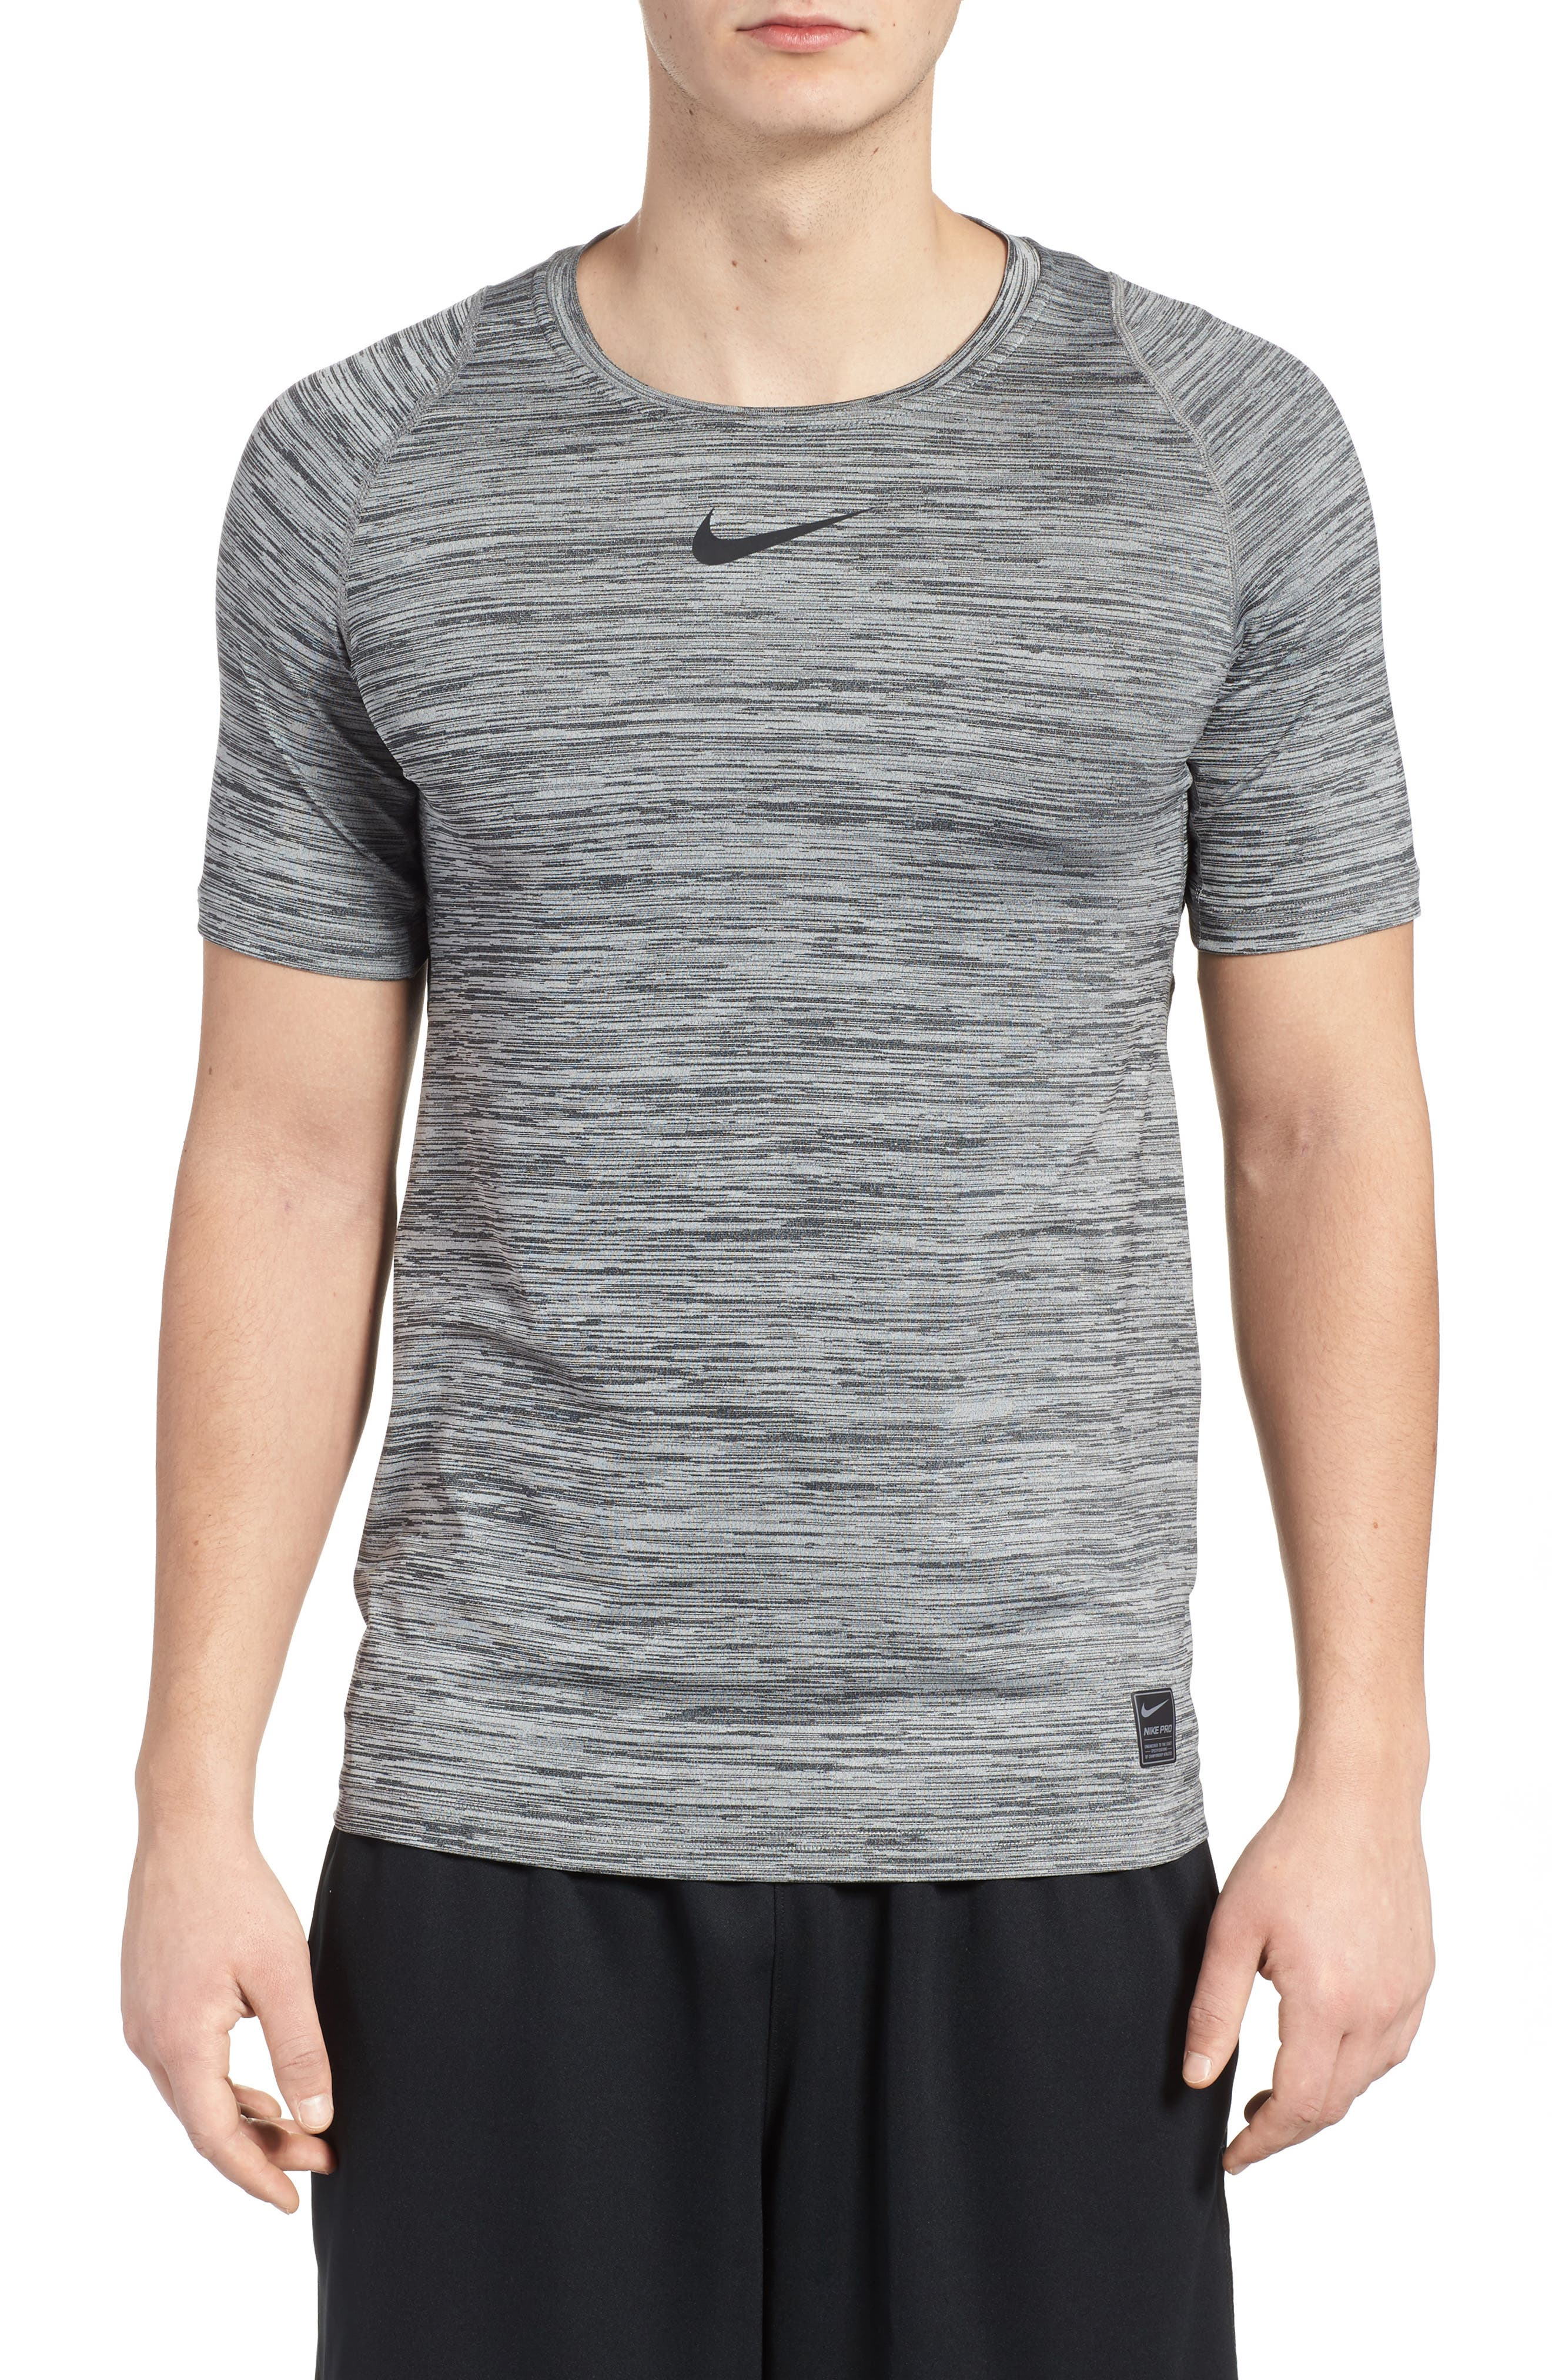 Training Top Crewneck T-Shirt,                         Main,                         color,